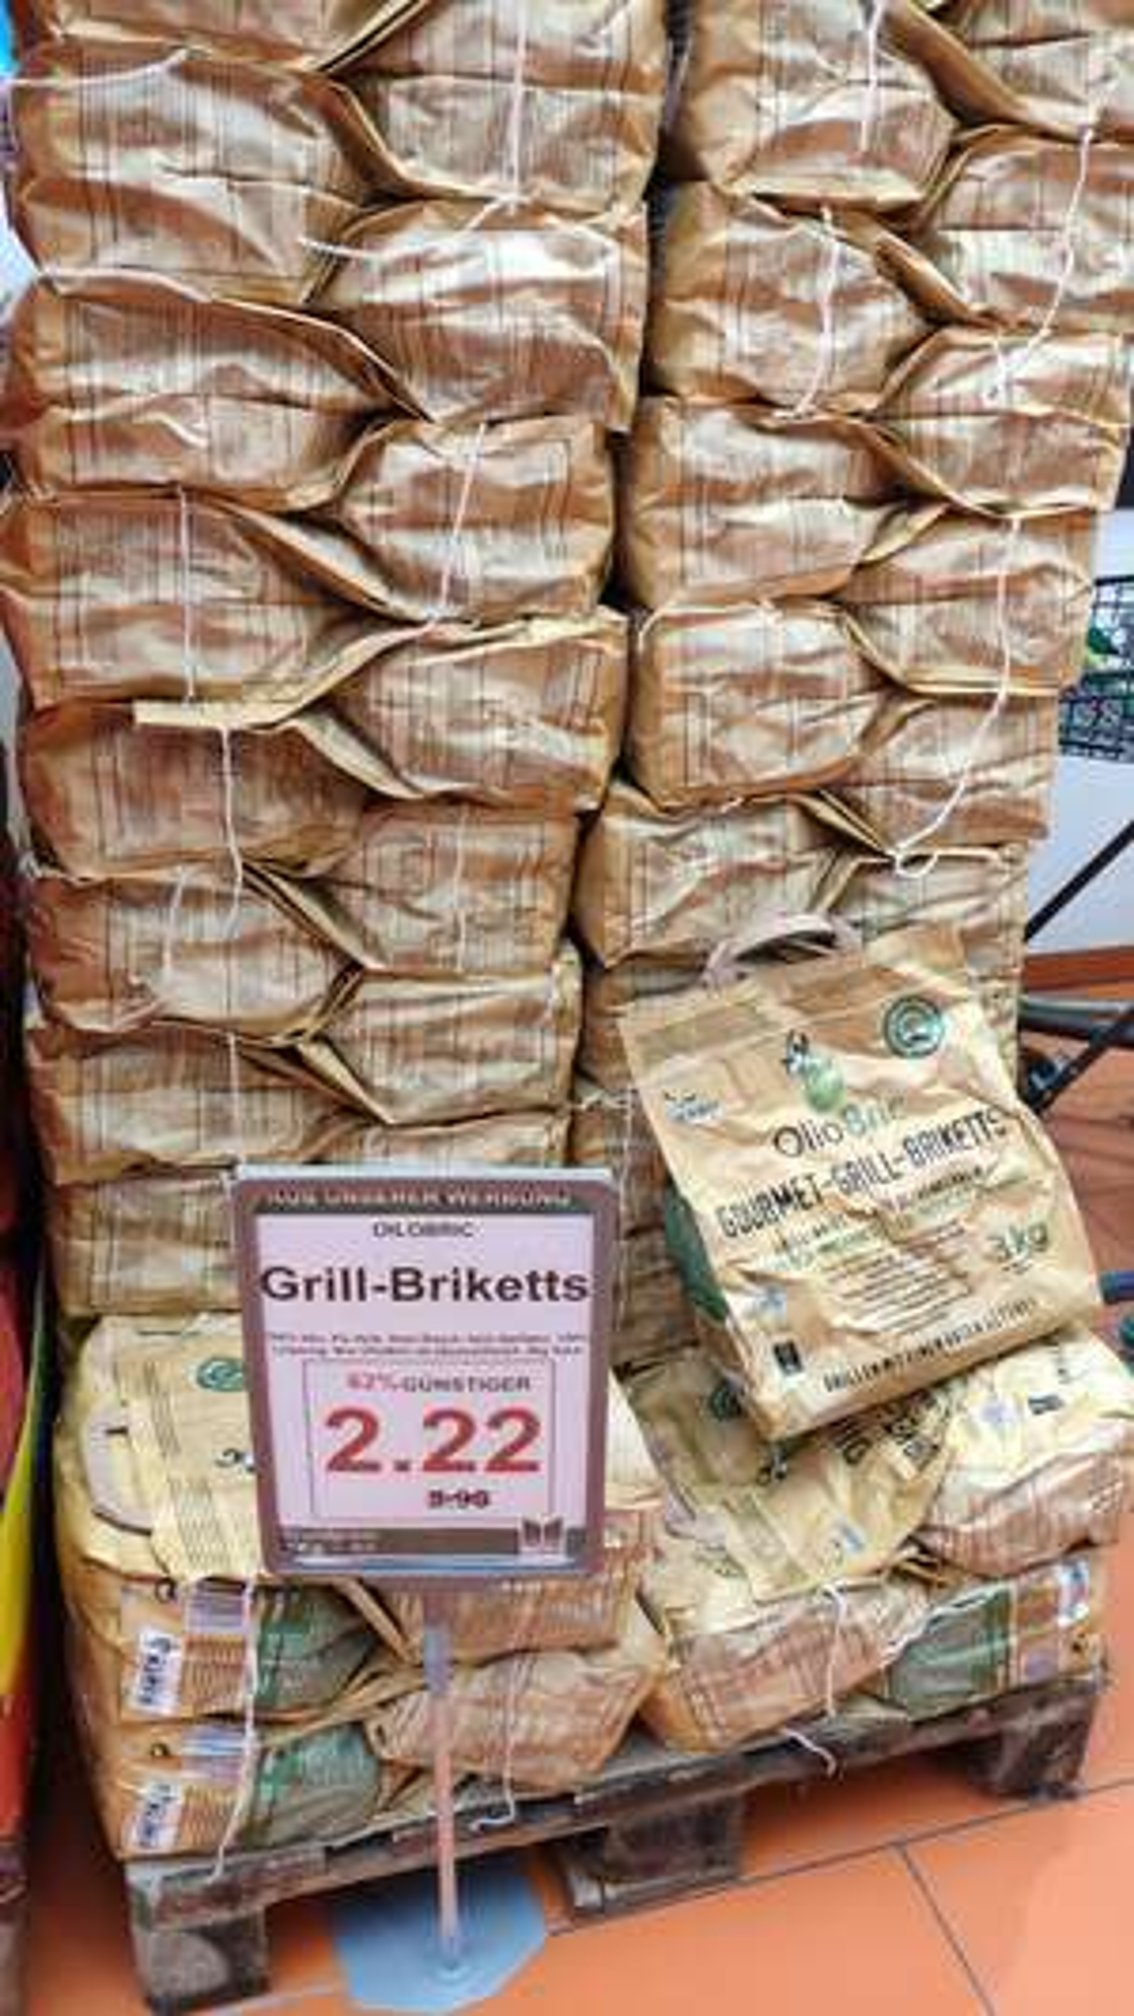 OlioBric Briketts Grillkohle Bio im Markttkauf (Lokal?)